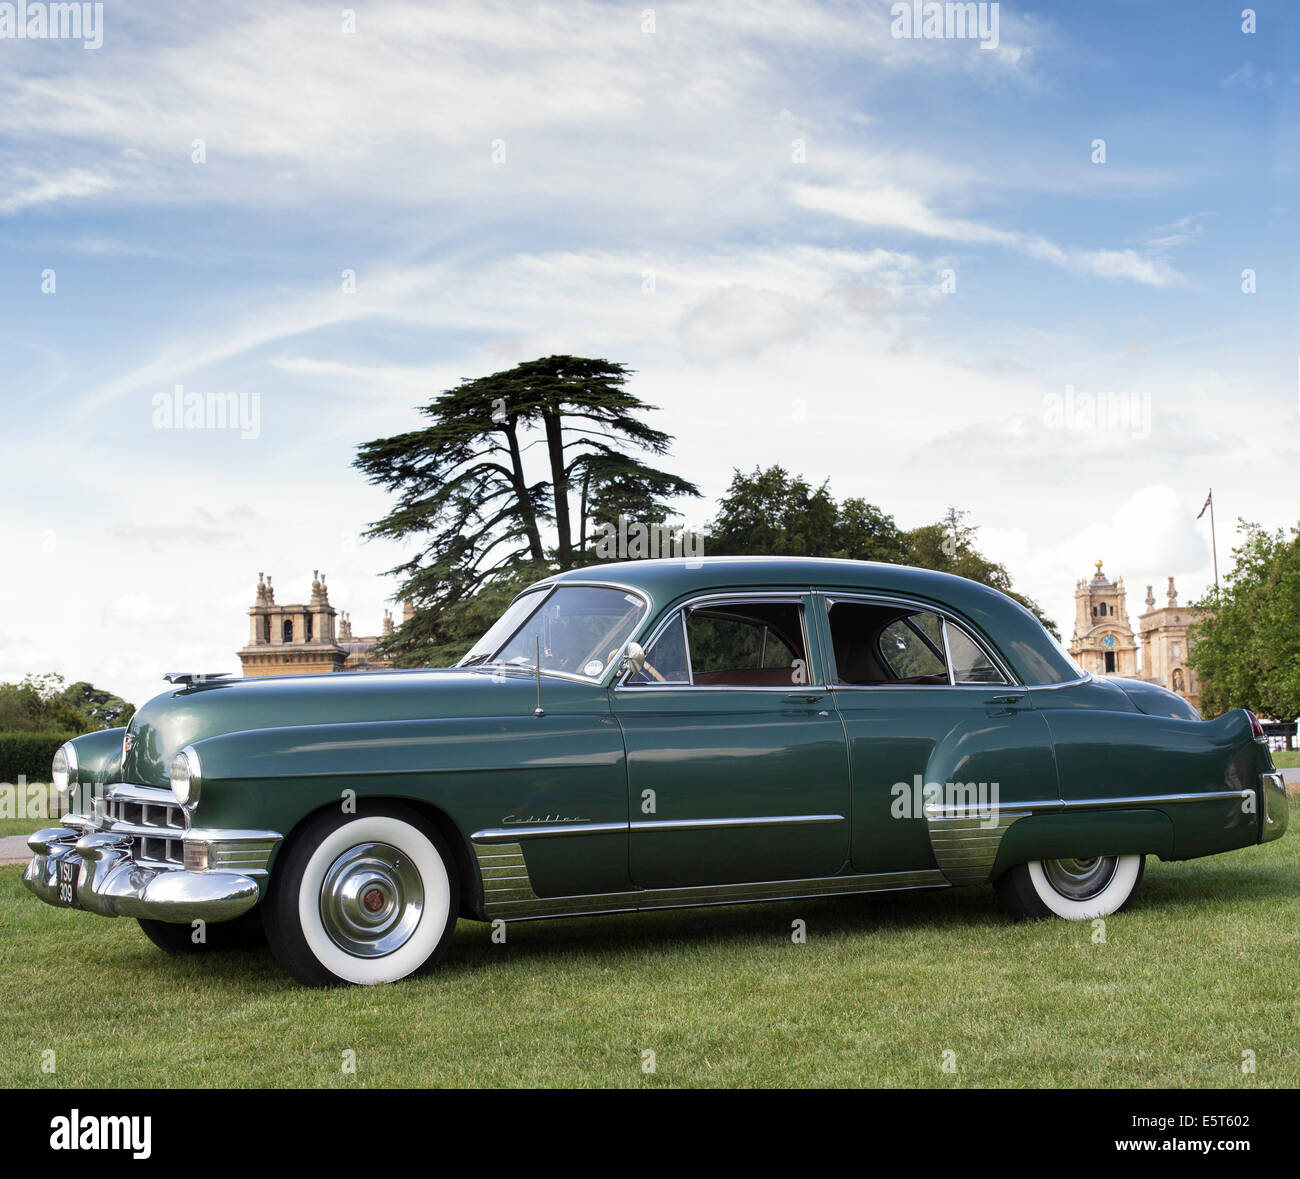 1941 Buick 40 Special: American Car 1940s Stock Photos & American Car 1940s Stock